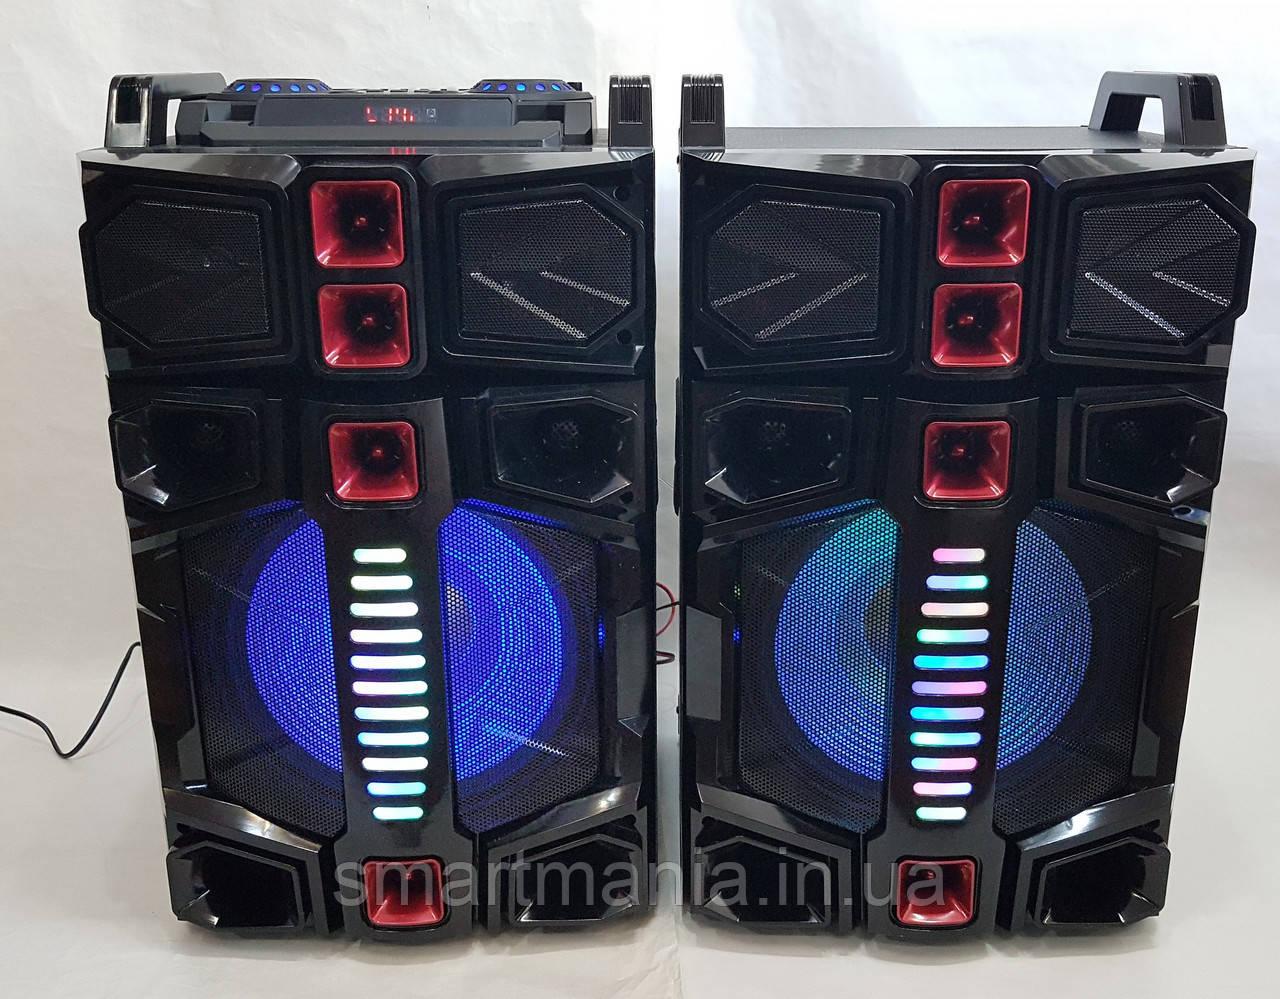 Активна стерео система колонки Wimpex WX-7314-12, 12 дюймів,350W (USB/Bluetooth/FM)